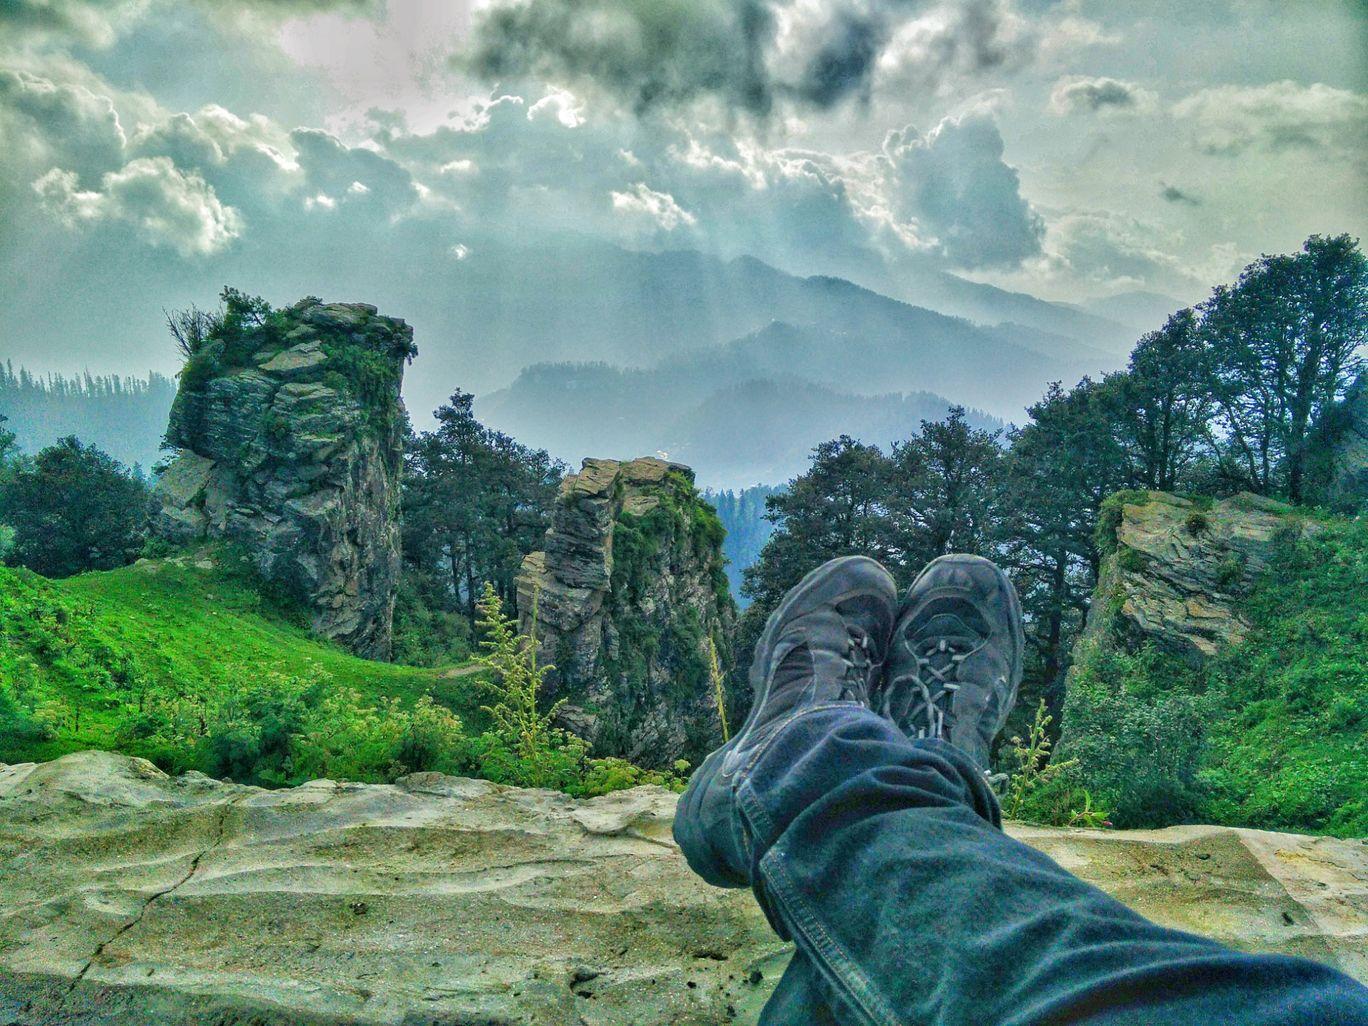 Photo of Hatu peak By Rohan Malik